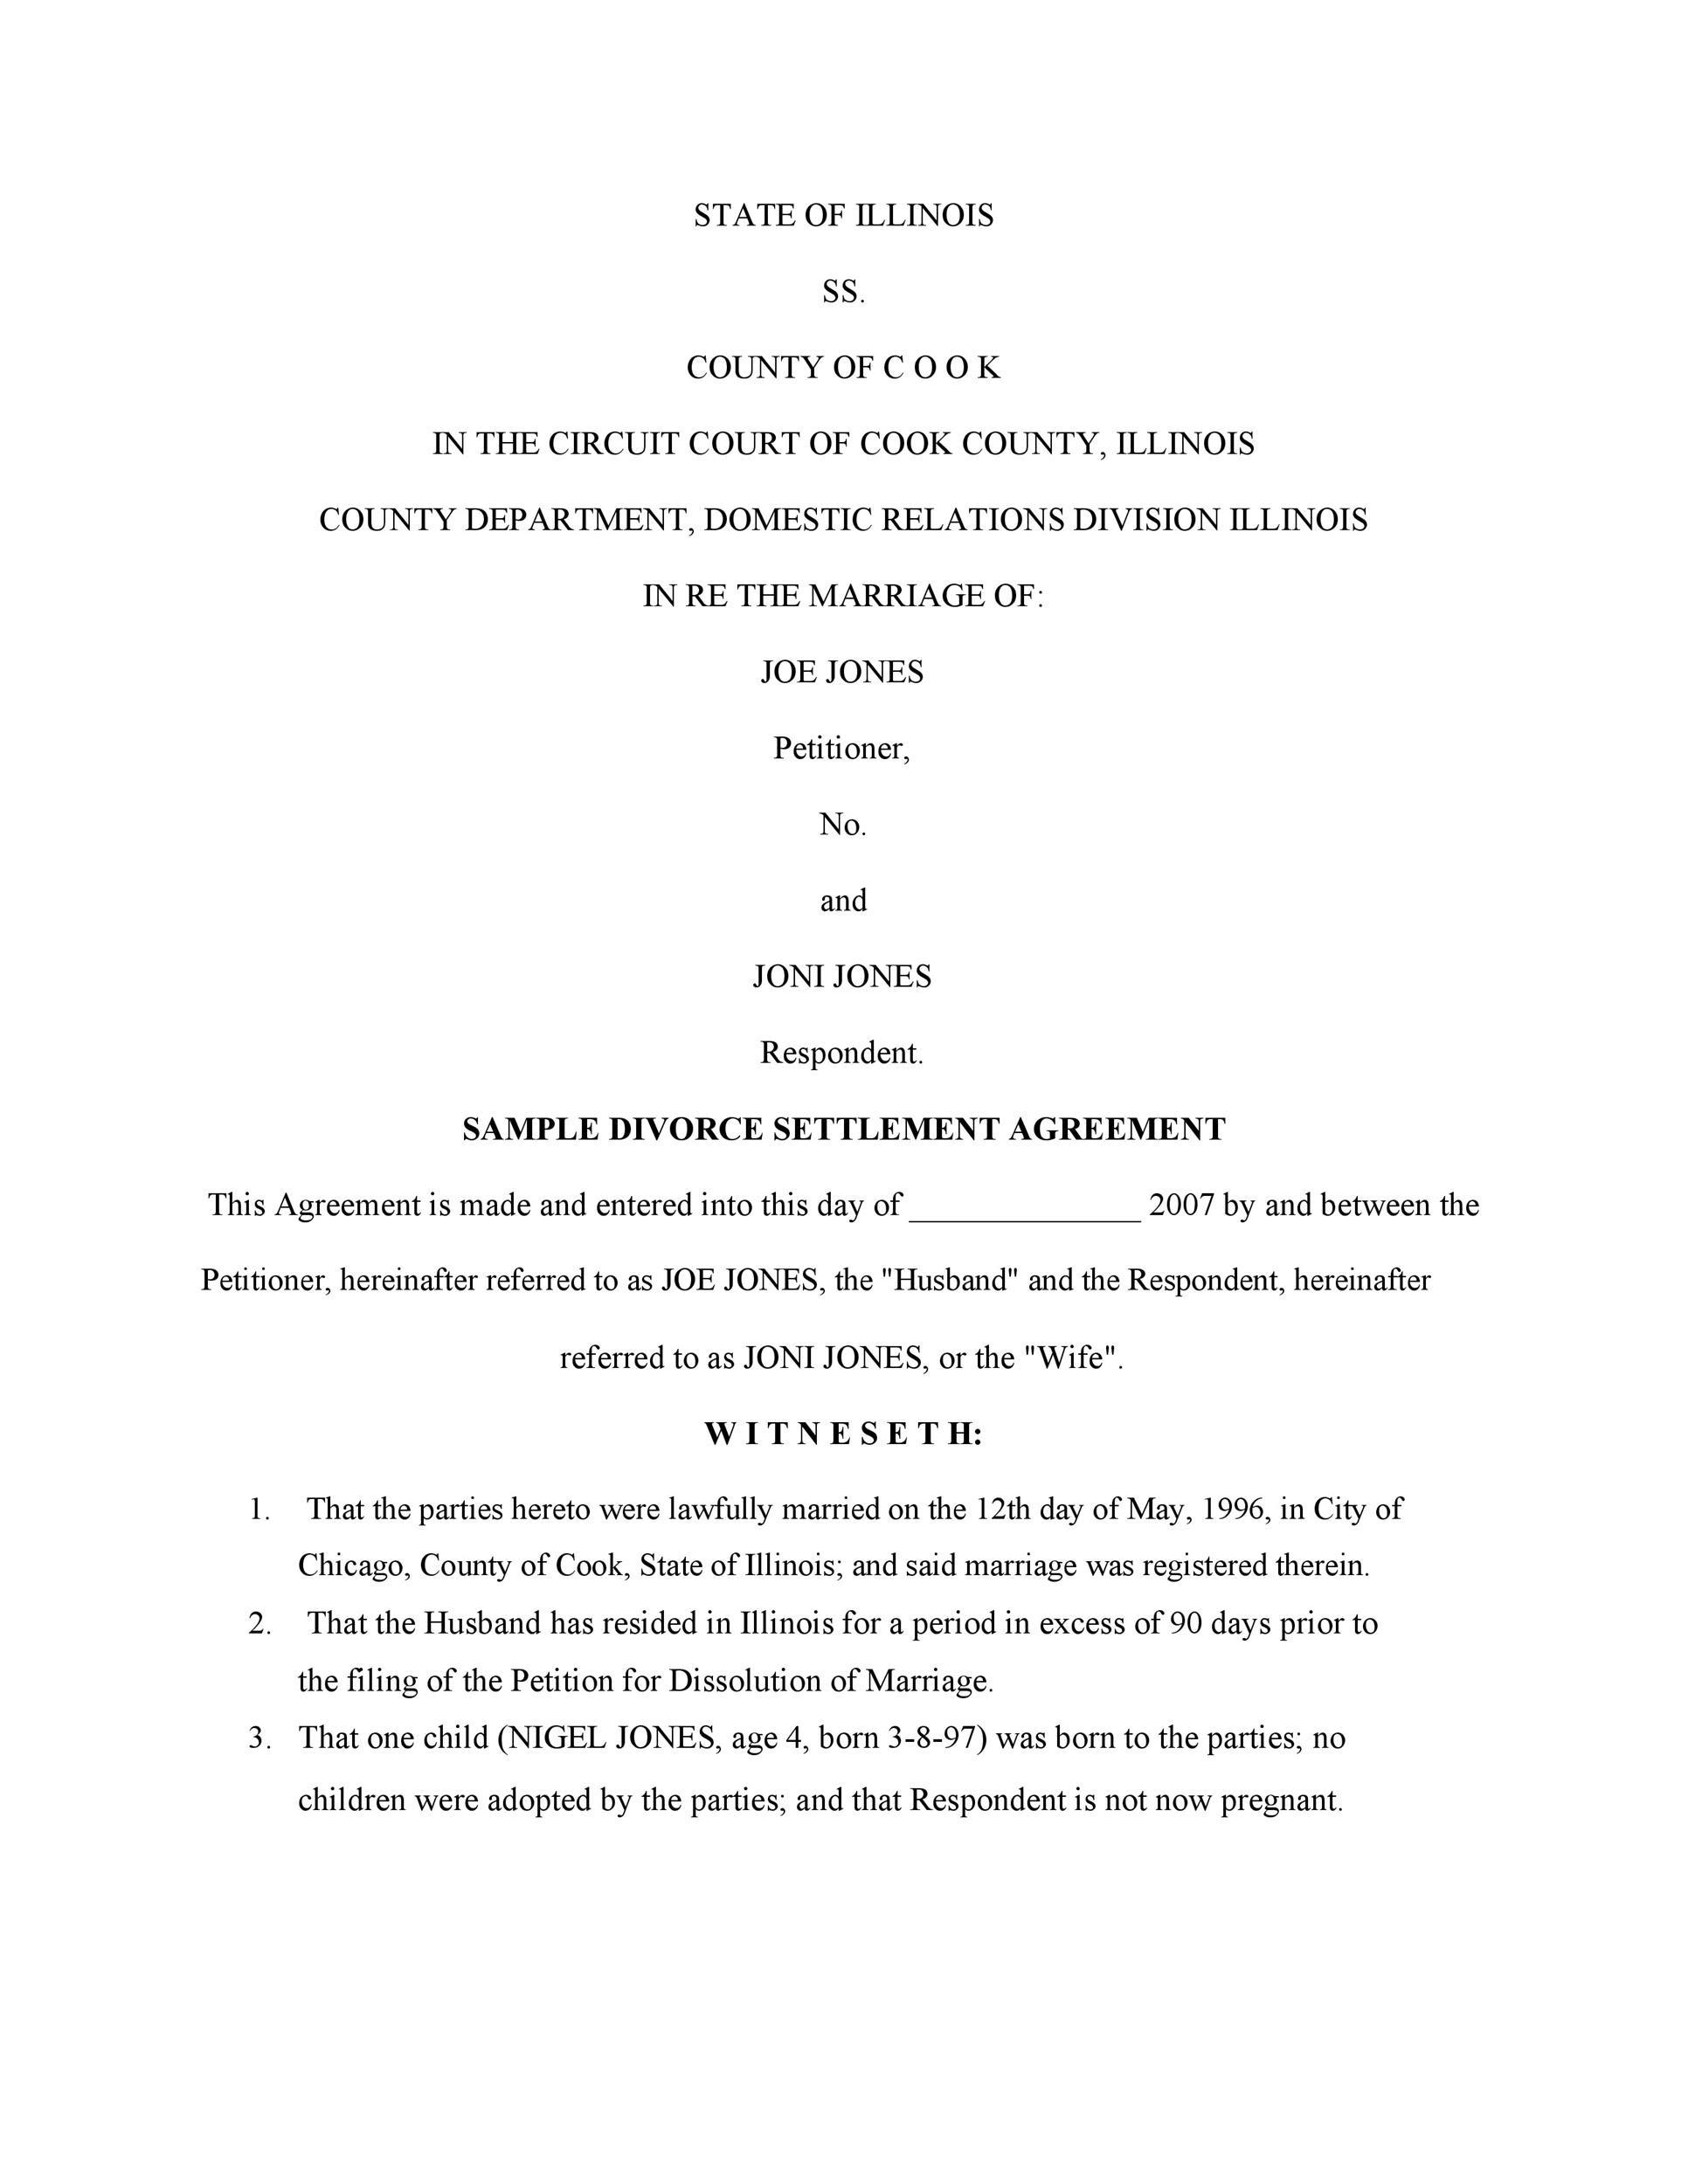 Free divorce agreement 21